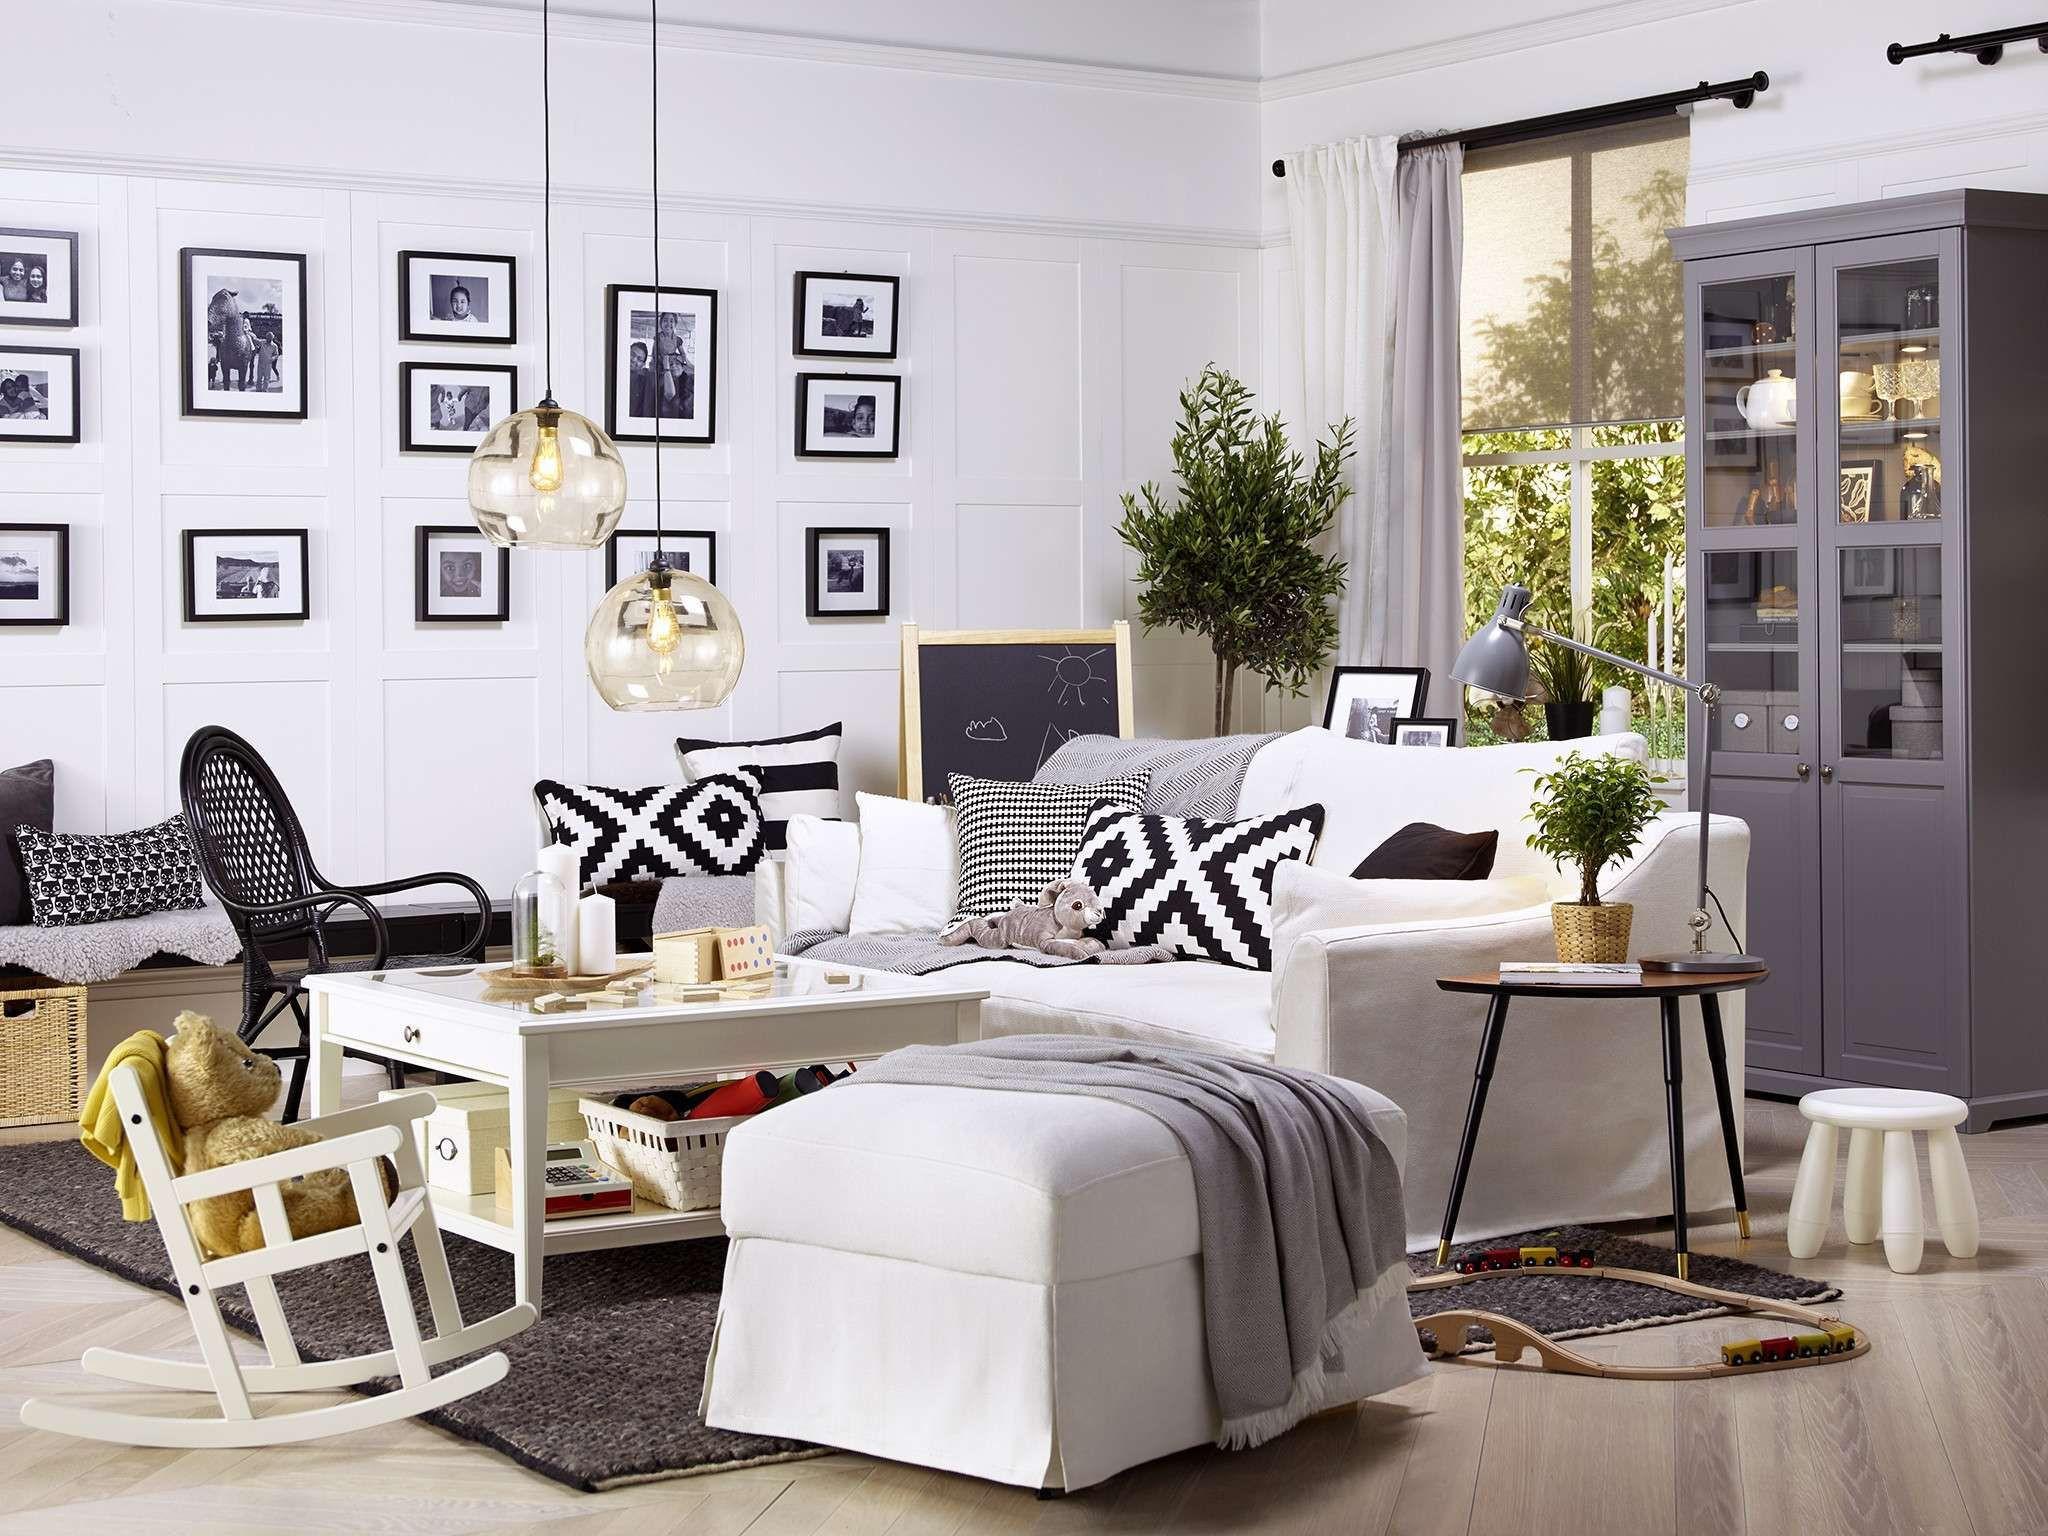 Dark Espresso Hardwood Floors Of 25 Elegant Hard Wood Floor Colors Accroalamode Intended for Hard Wood Floor Colors Lovely 40 What Color Furniture Goes with Grey Flooring Ideas Of 25